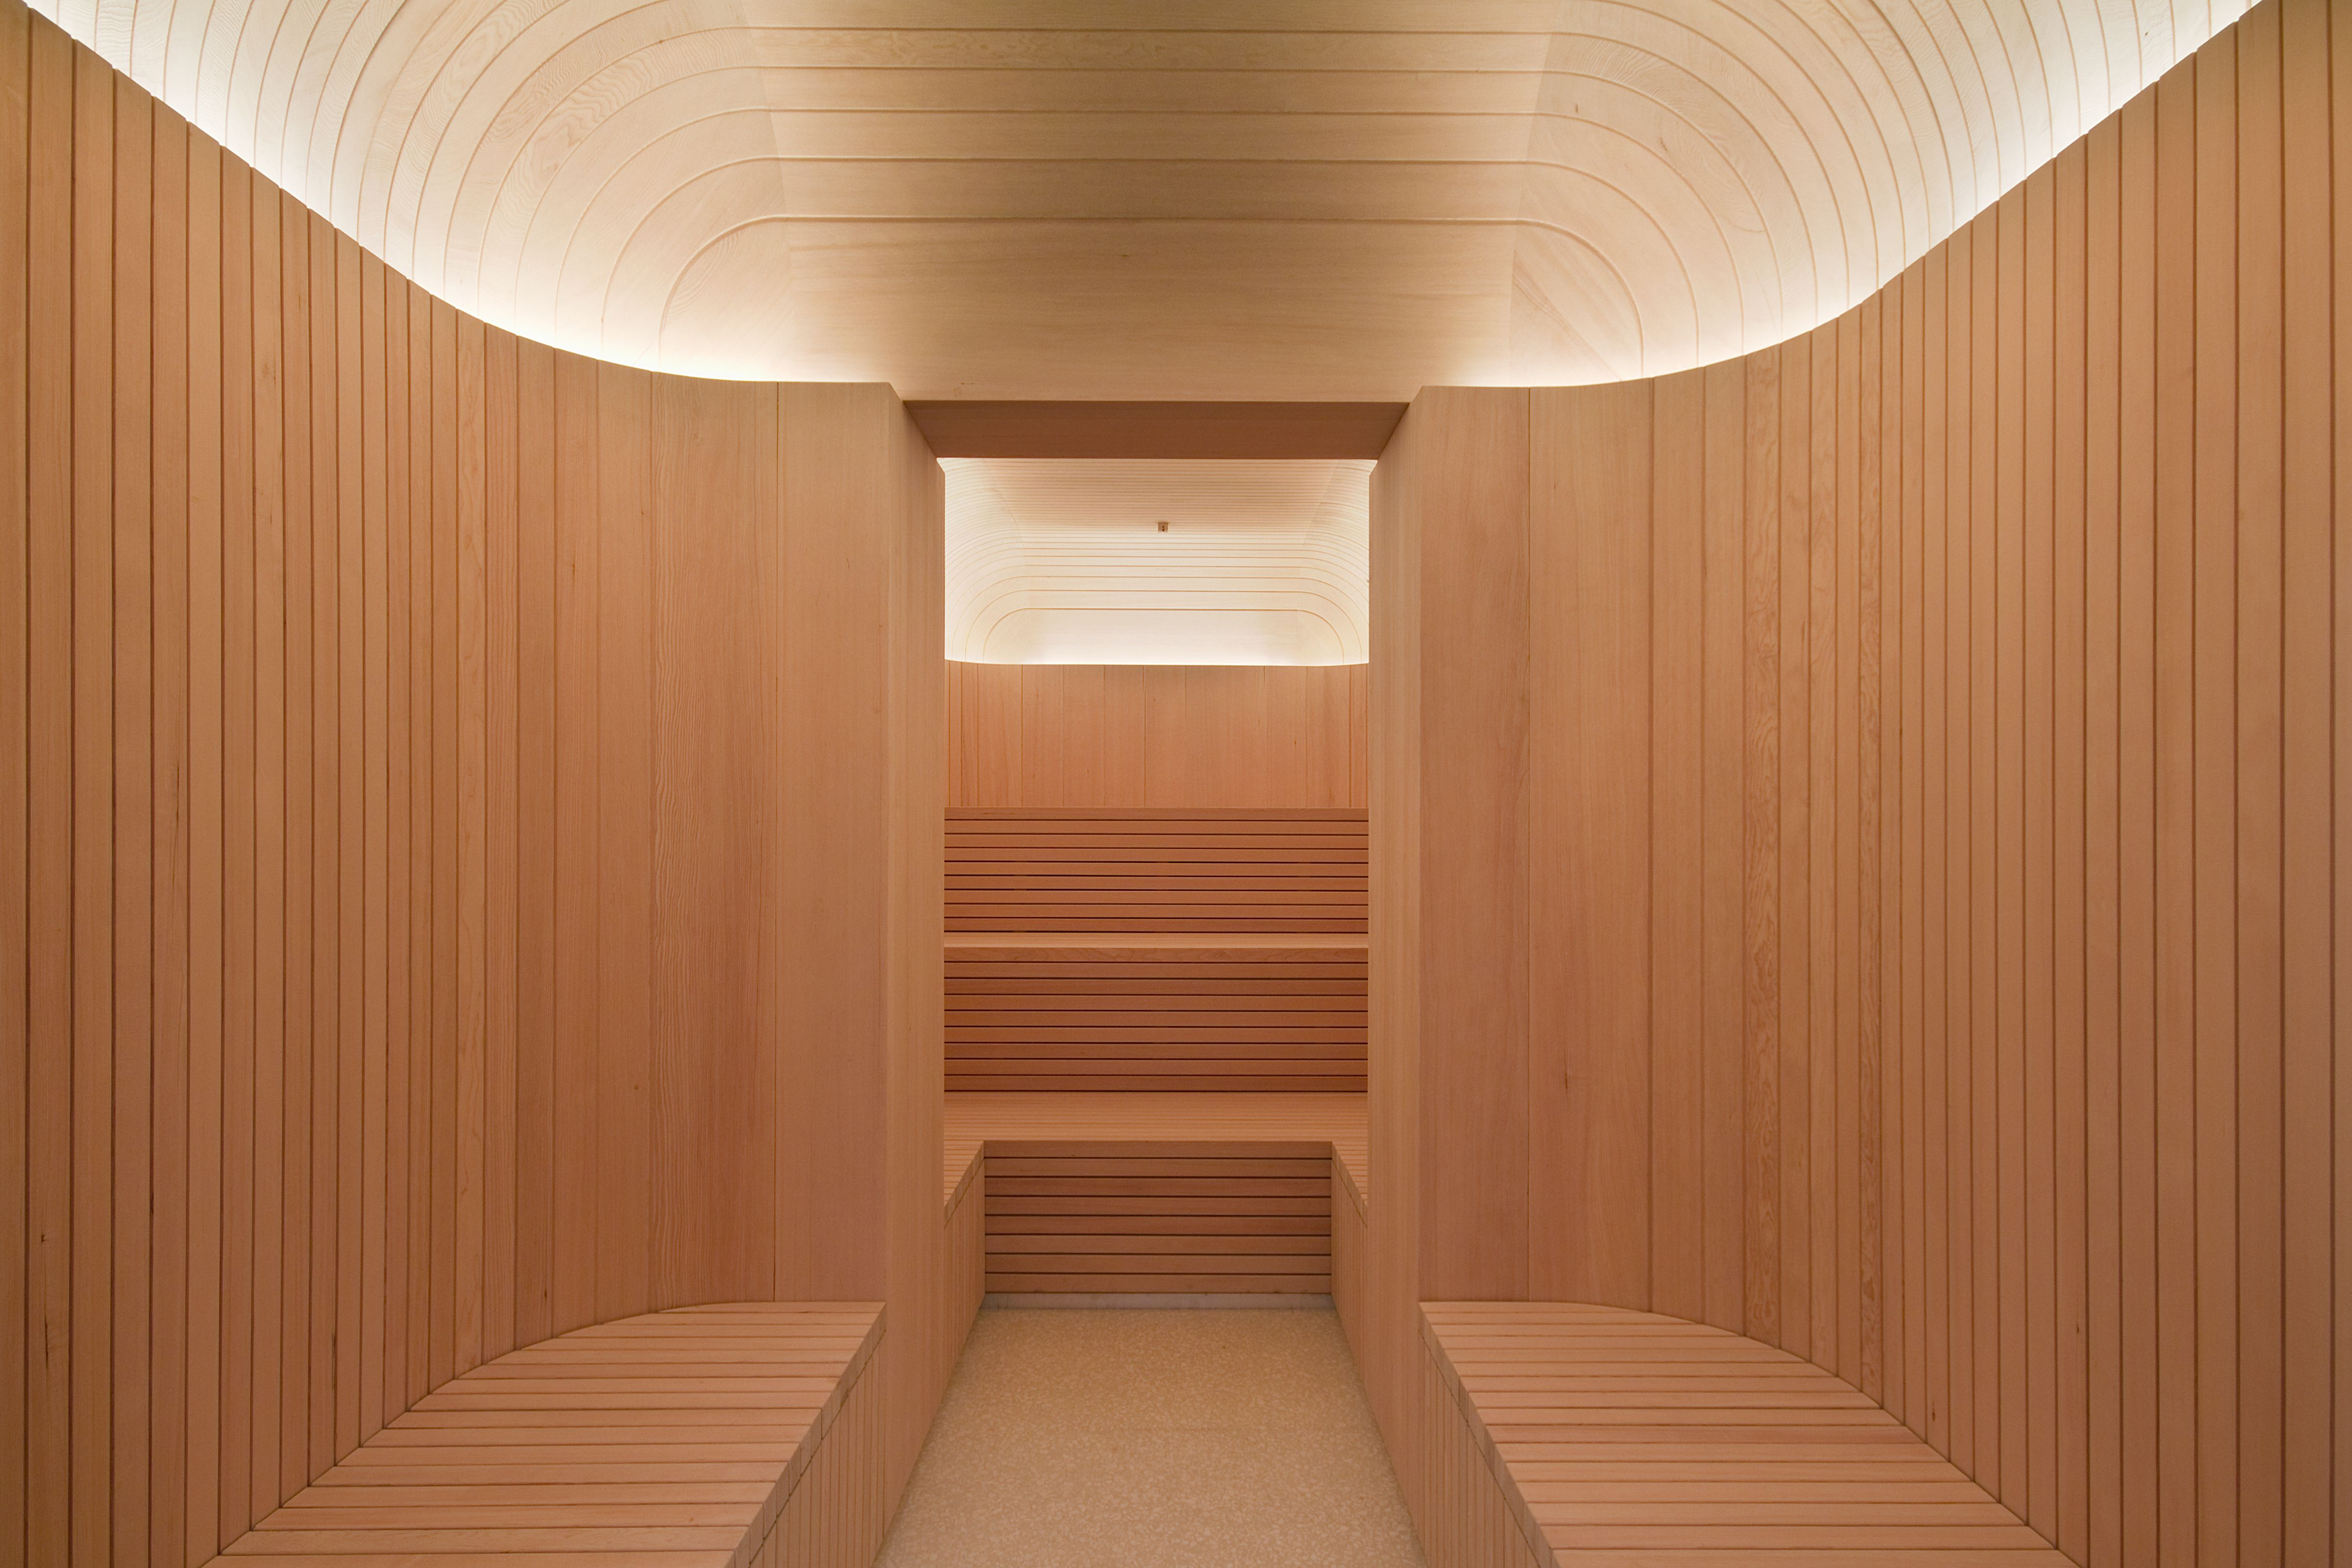 Custom Made Sauna For Caf Royal, London Designed By David